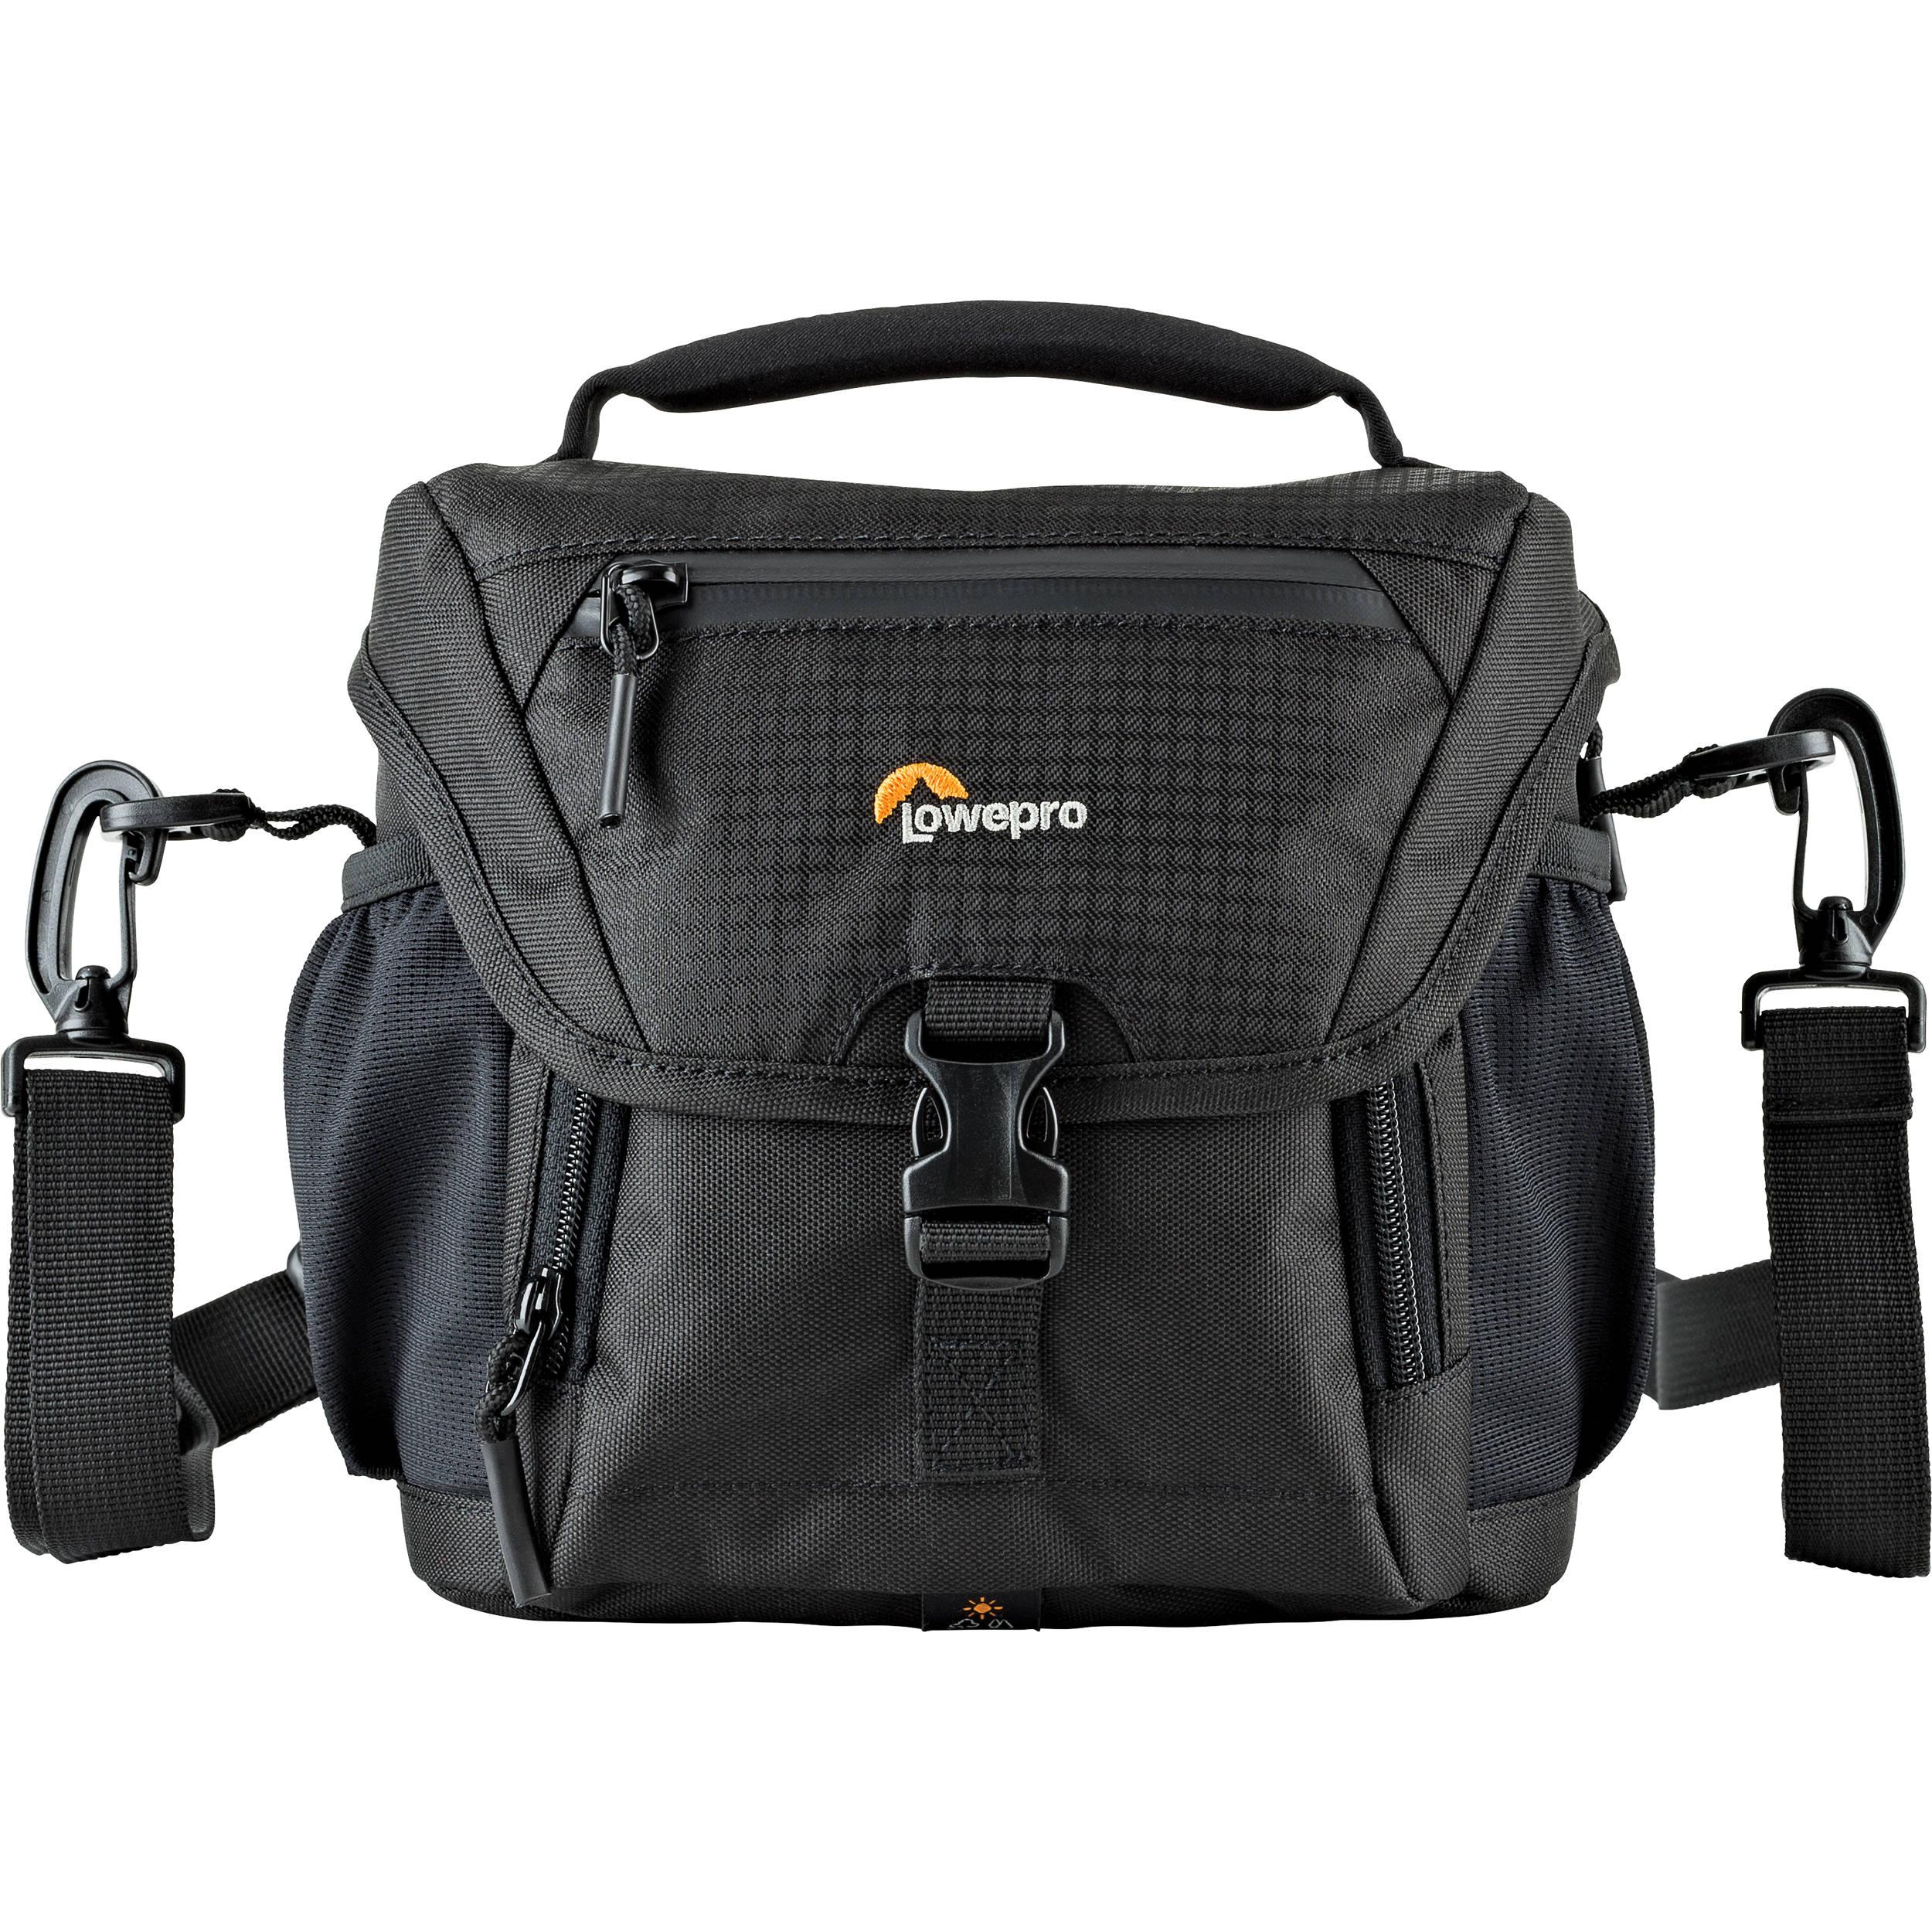 Lowepro Nova 140 Aw Ii Camera Bag Black